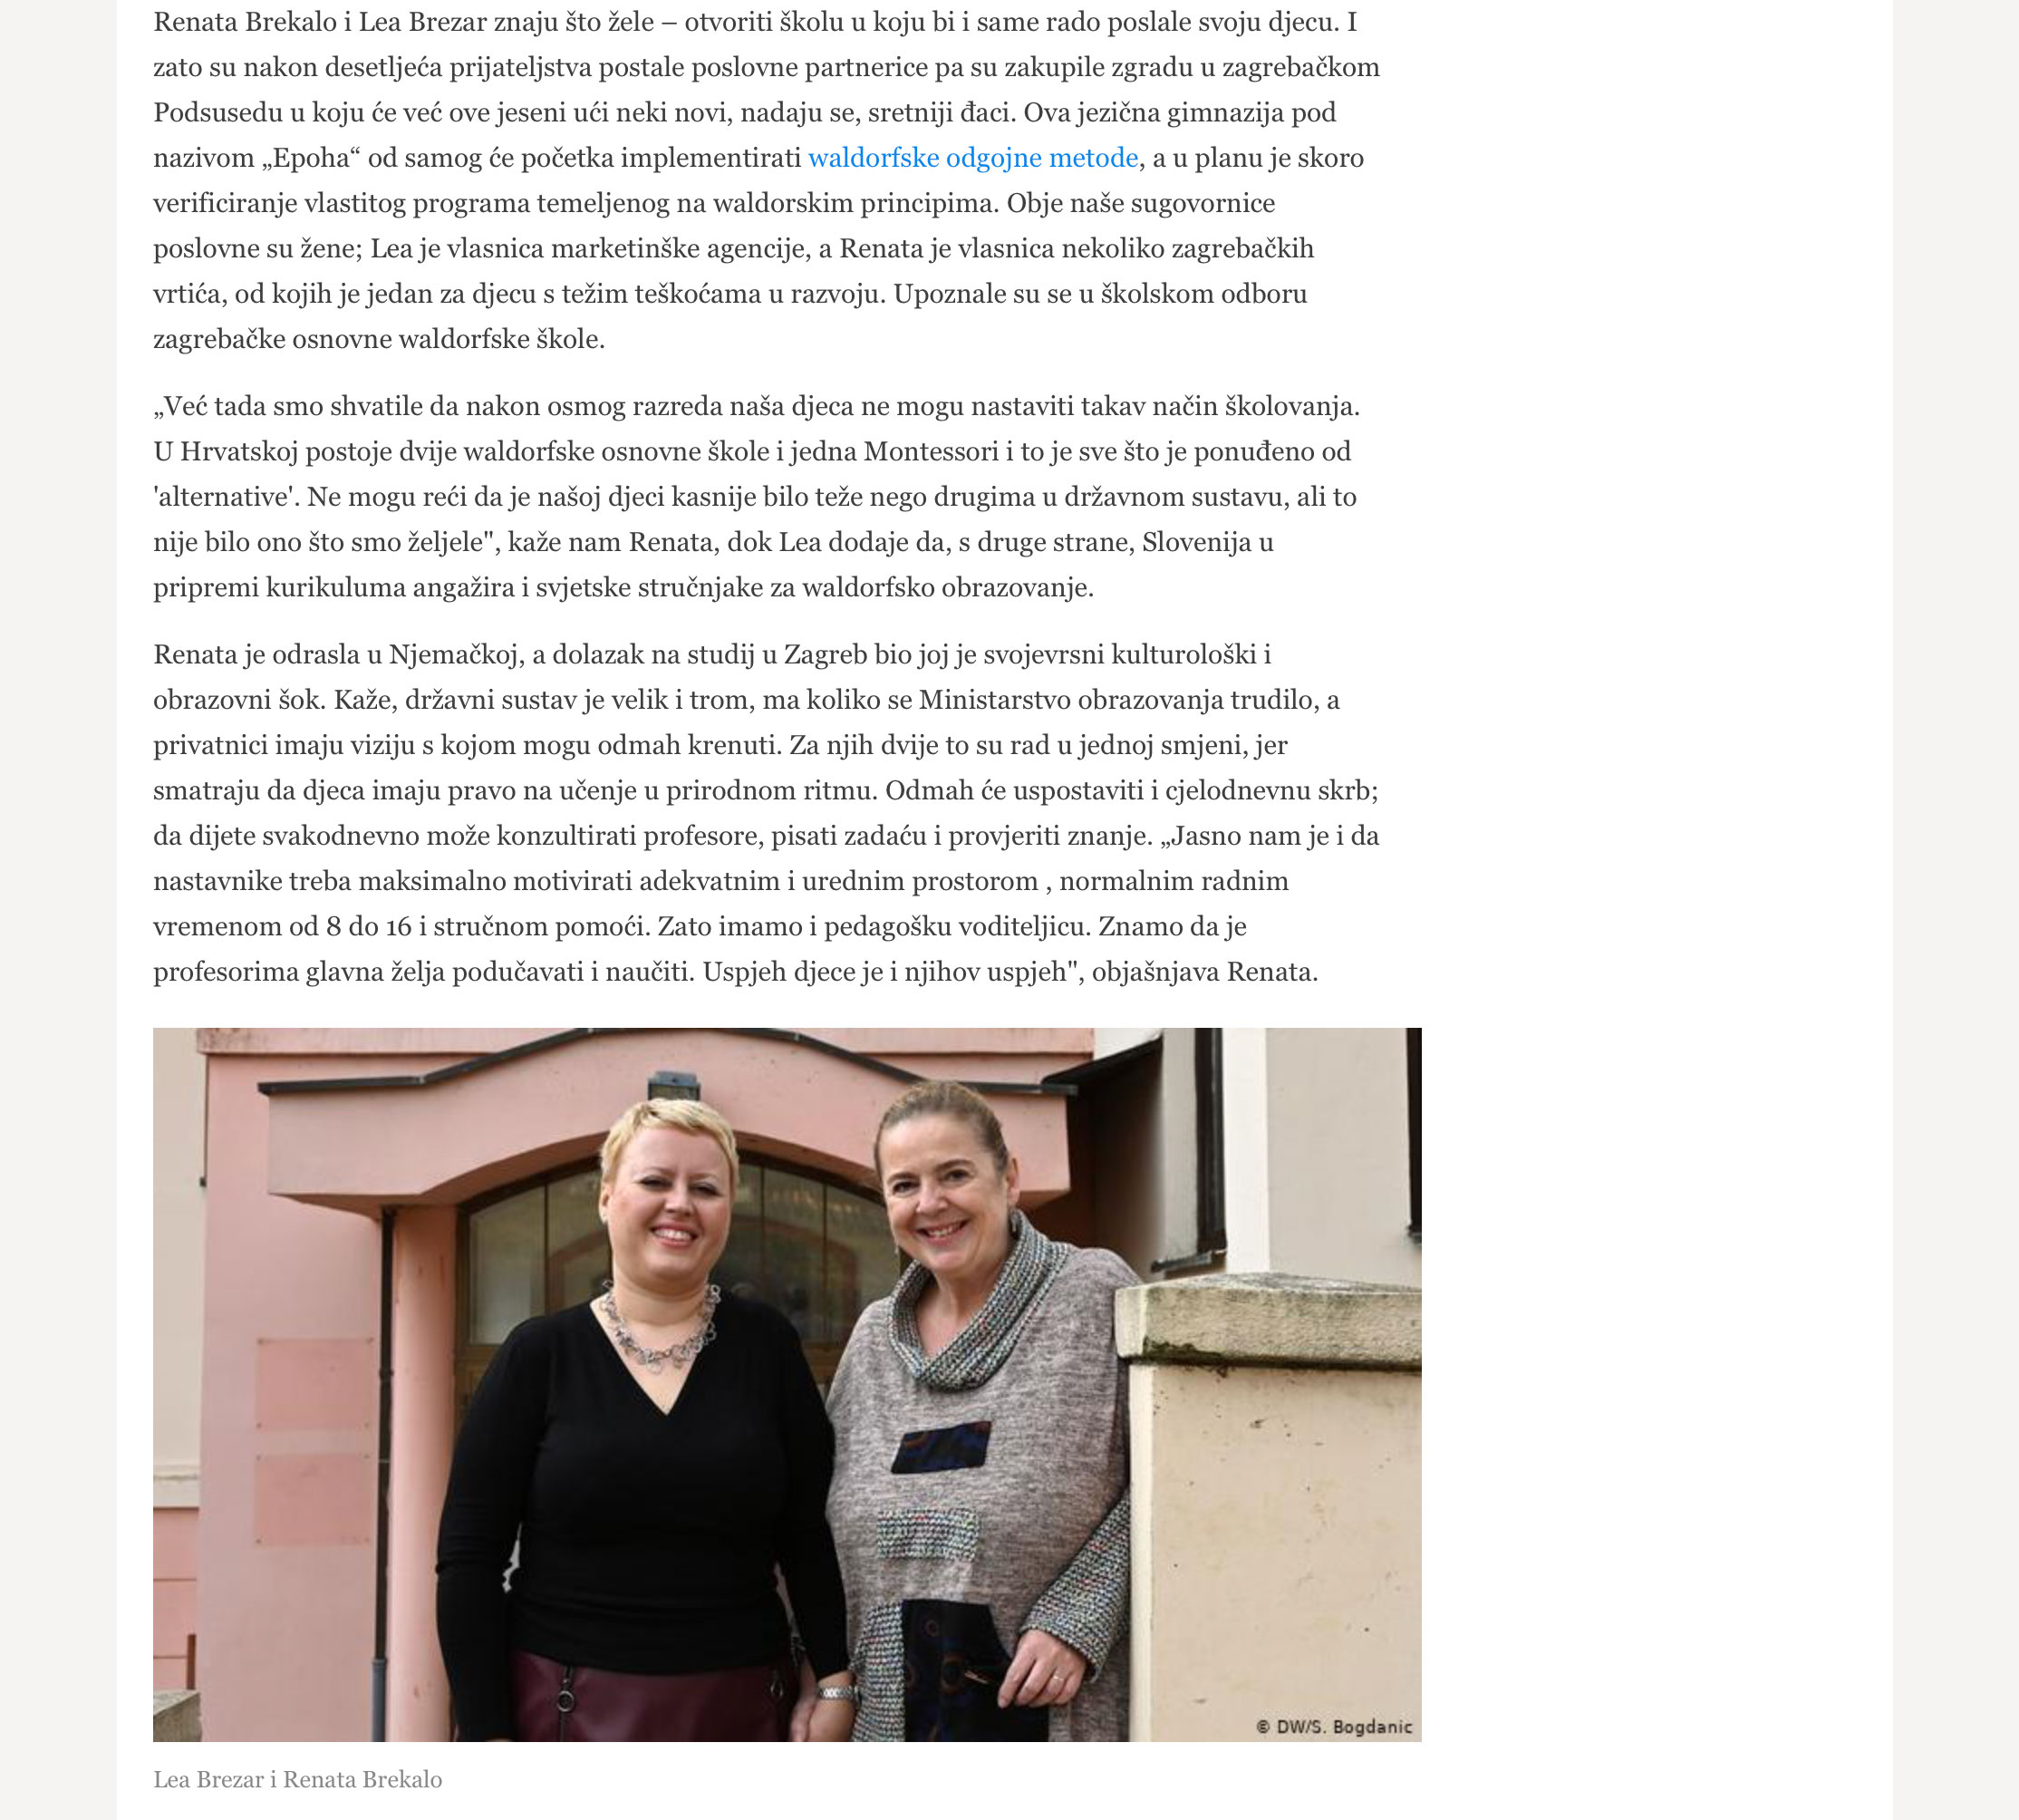 Siniša Bogdanović, Deutsche Welle, 2020